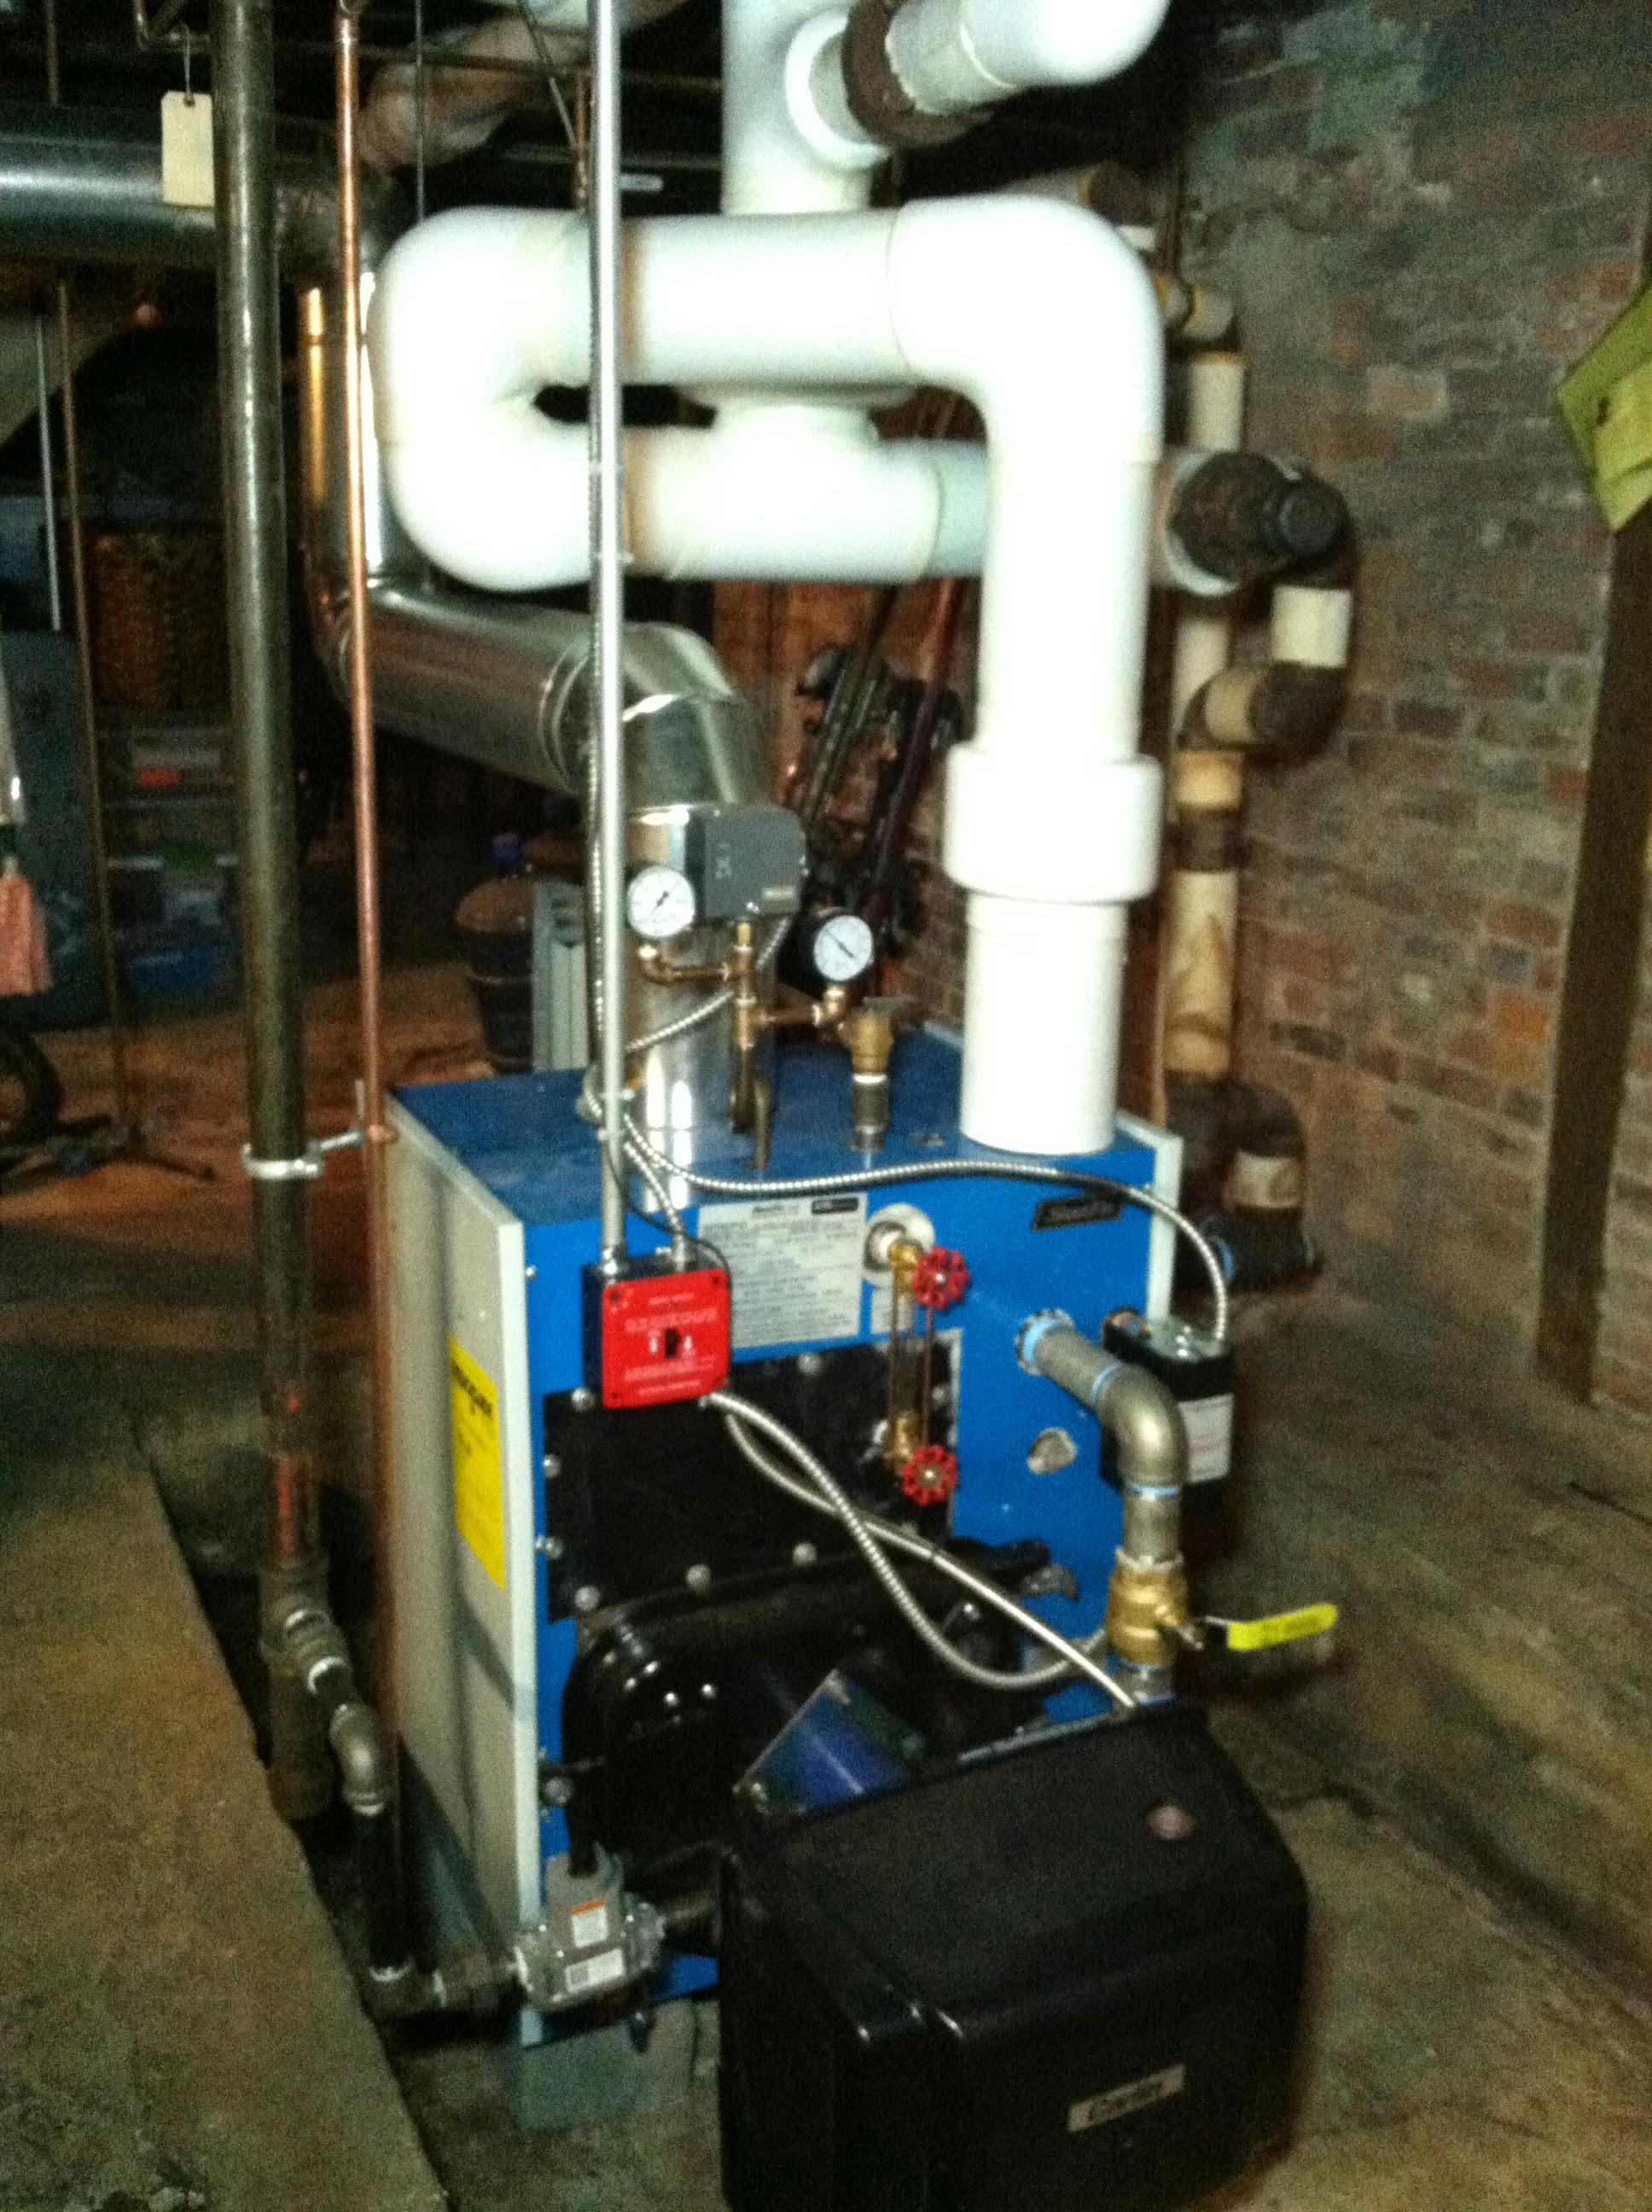 New Slant Fin Intrepid With Ez Gas Burner Heating Help The Wall Boiler Wiring Diagram Slantfin